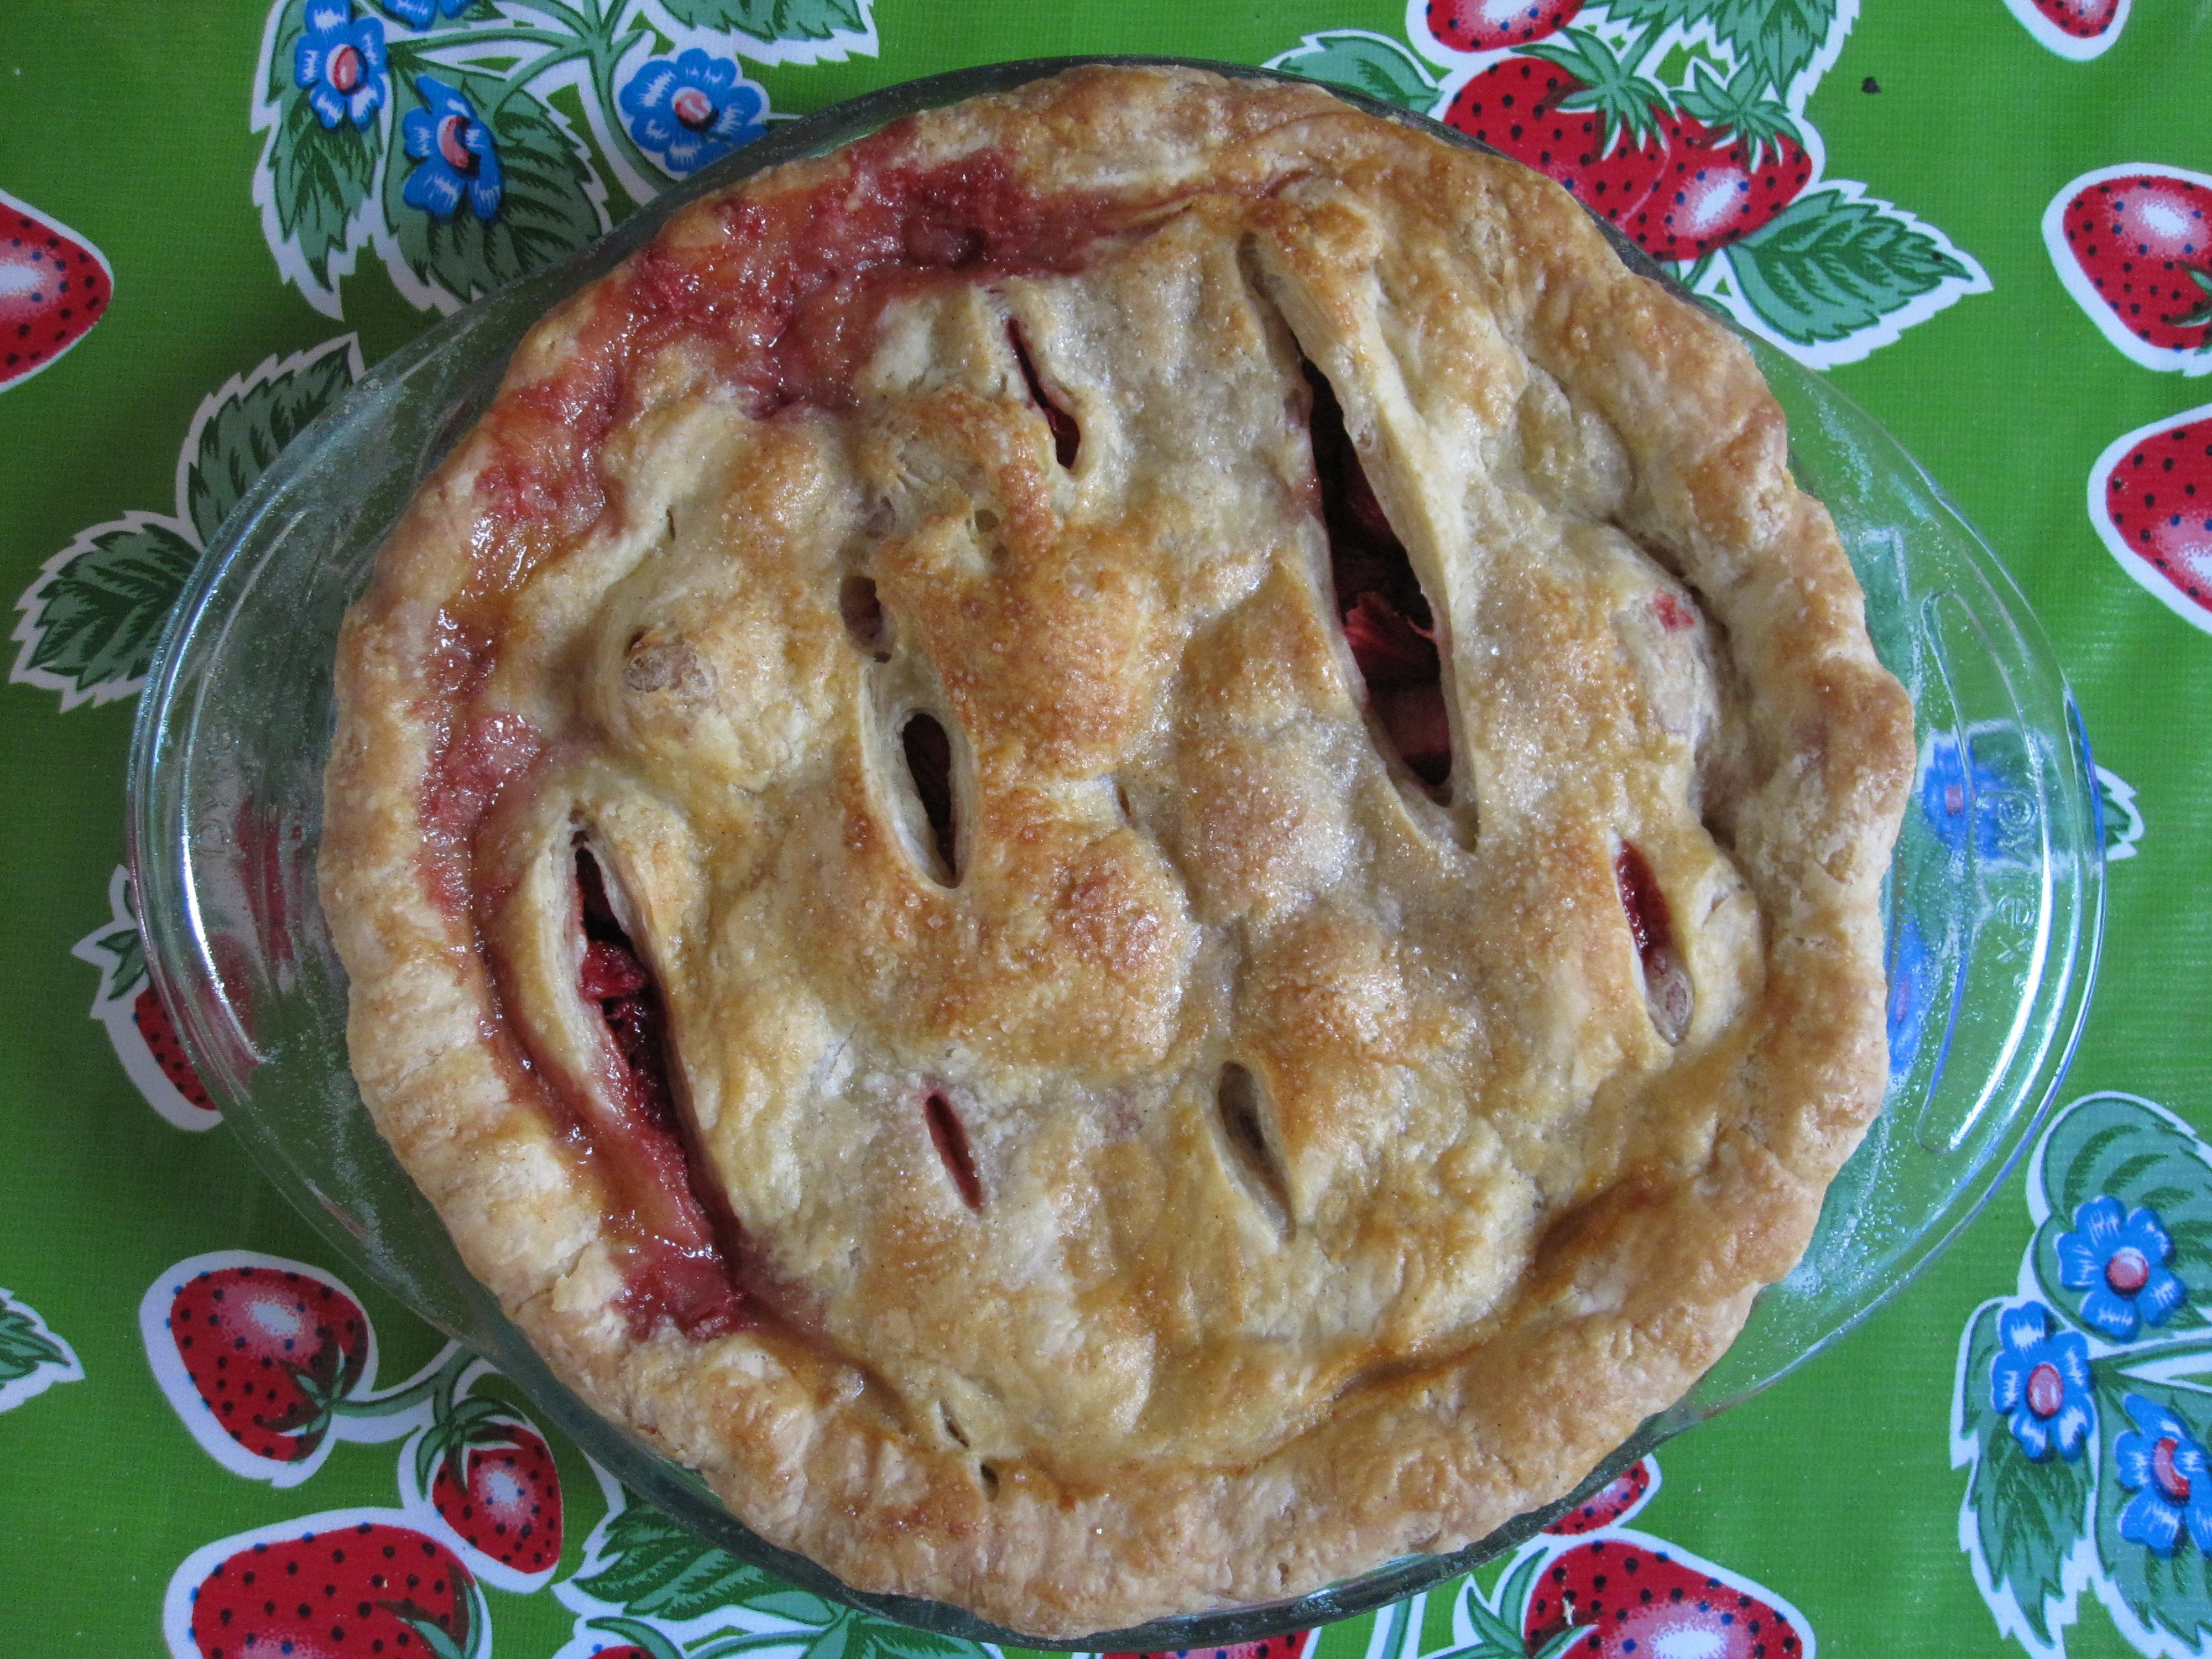 Strawberry Patron Cake Recipe